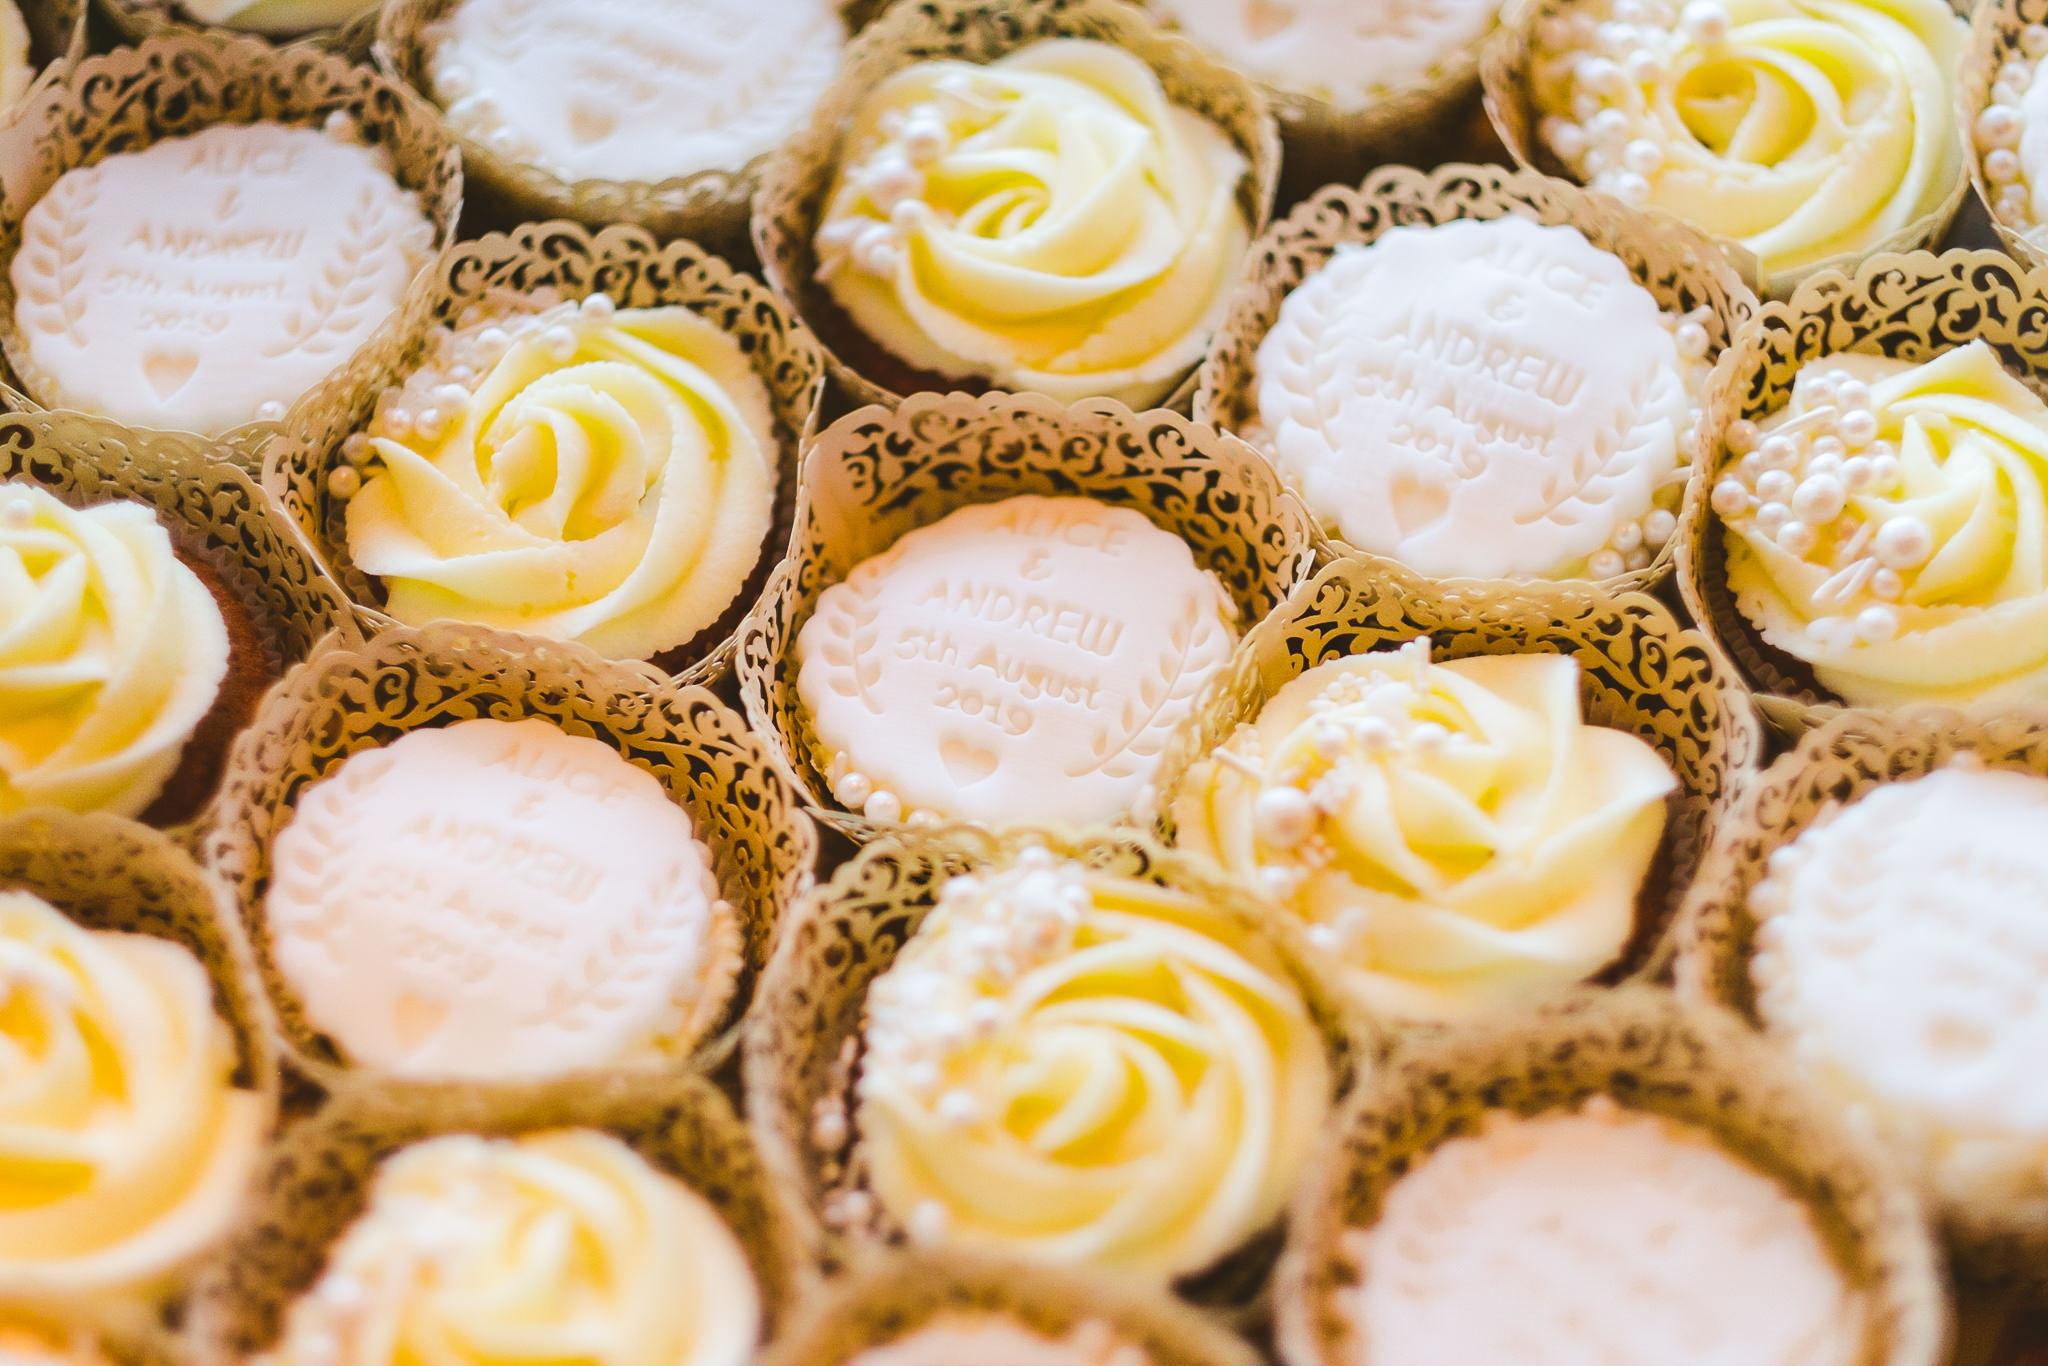 Close up of wedding cupcakes